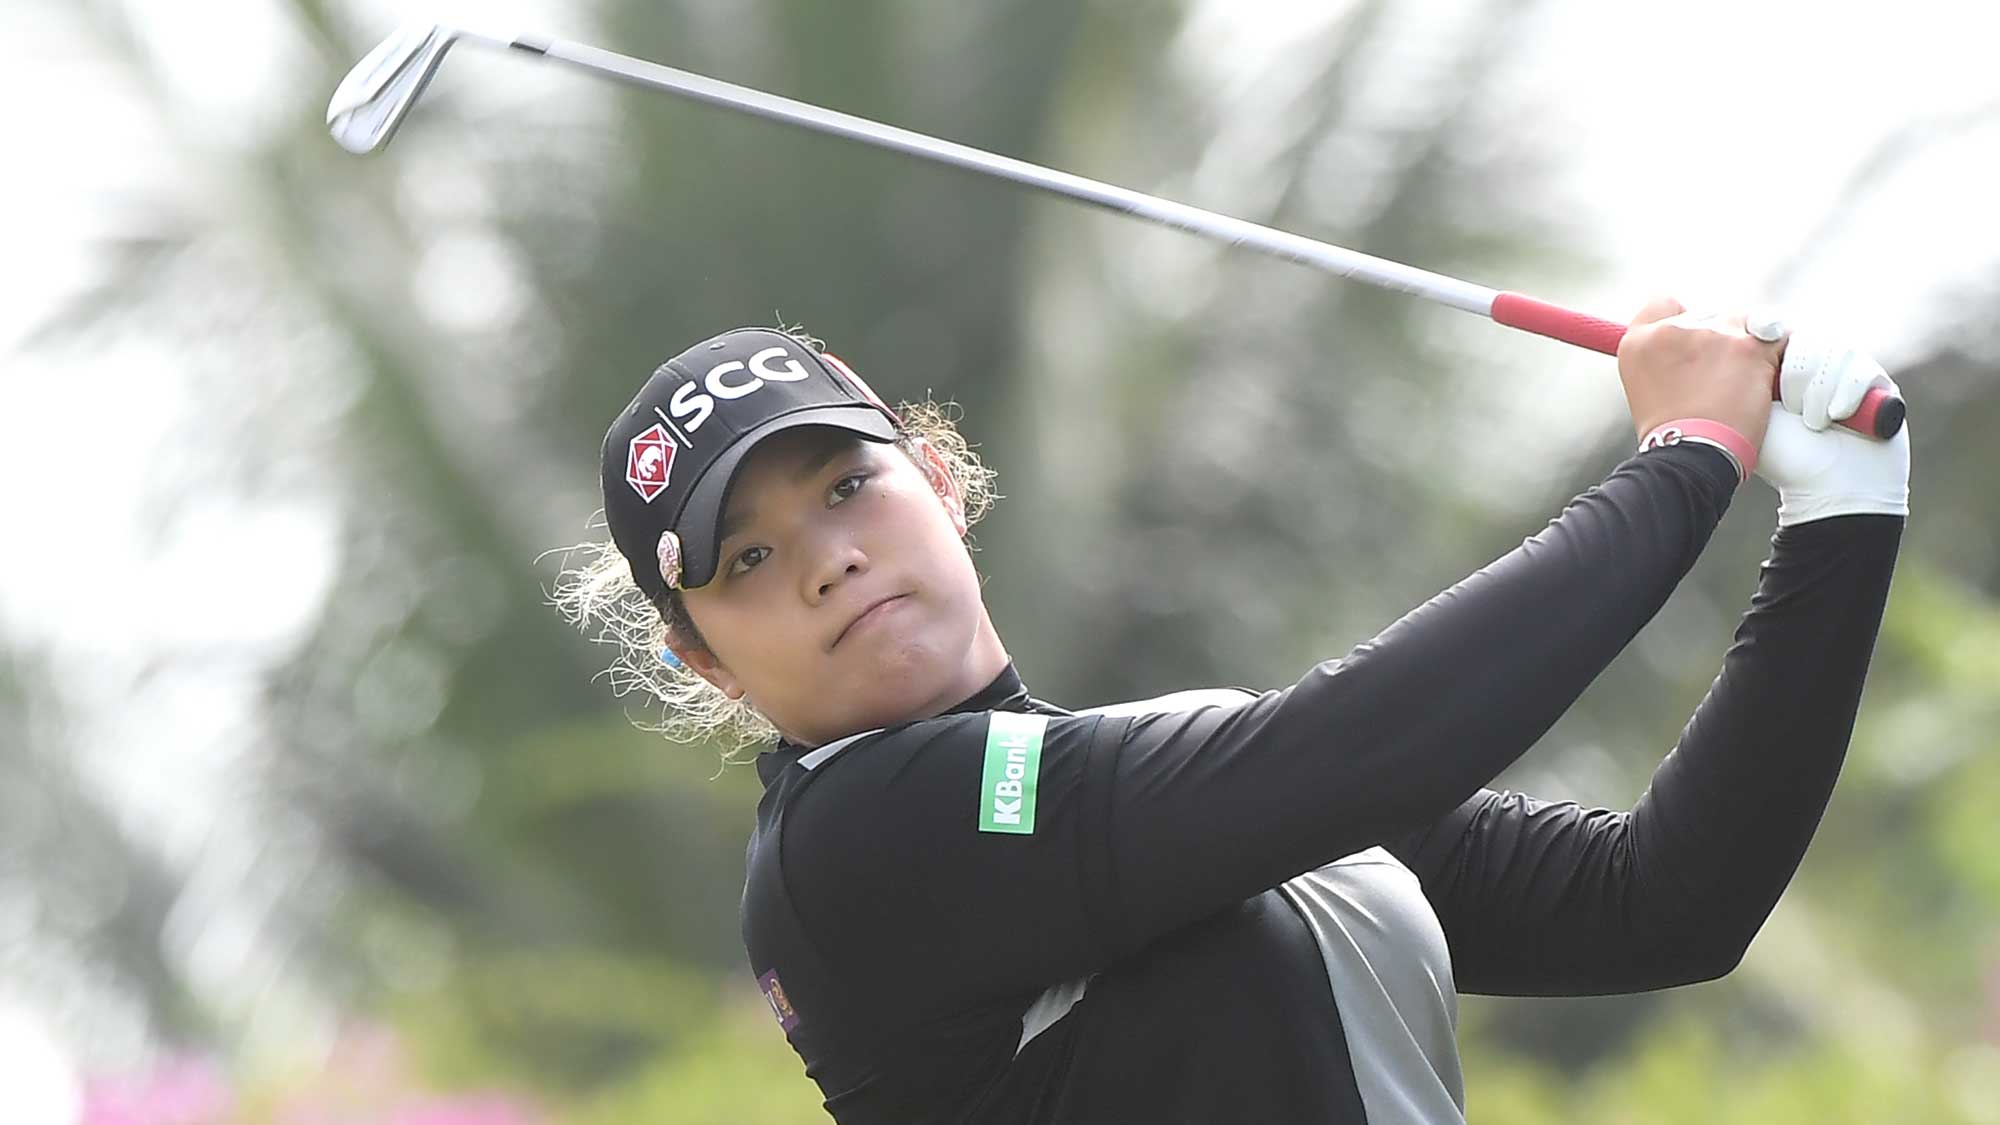 Main article: List of female golfers nude photos 2019